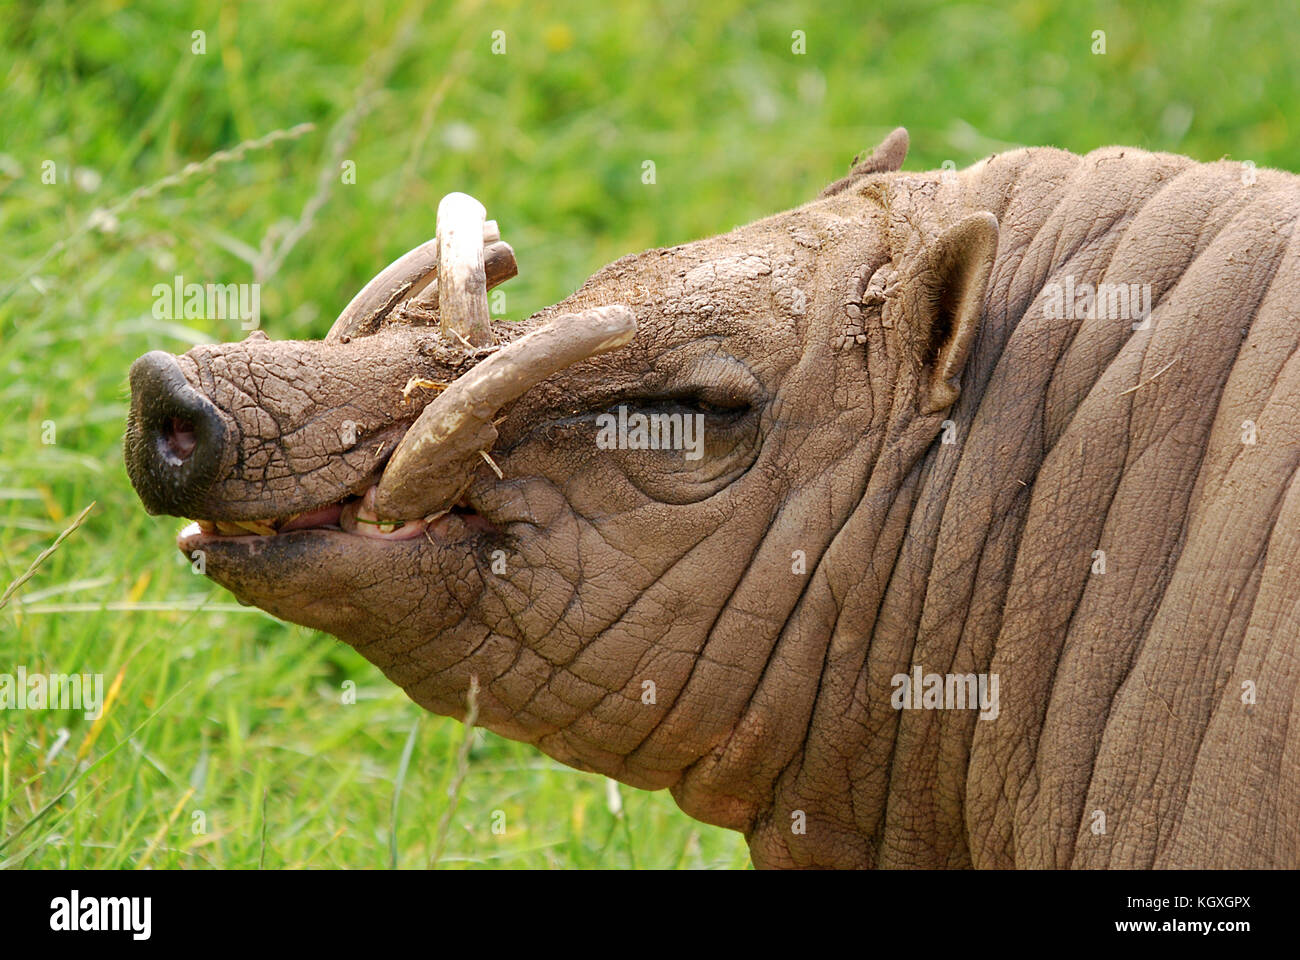 Barbirusa - Buru babirusa - Stock Image